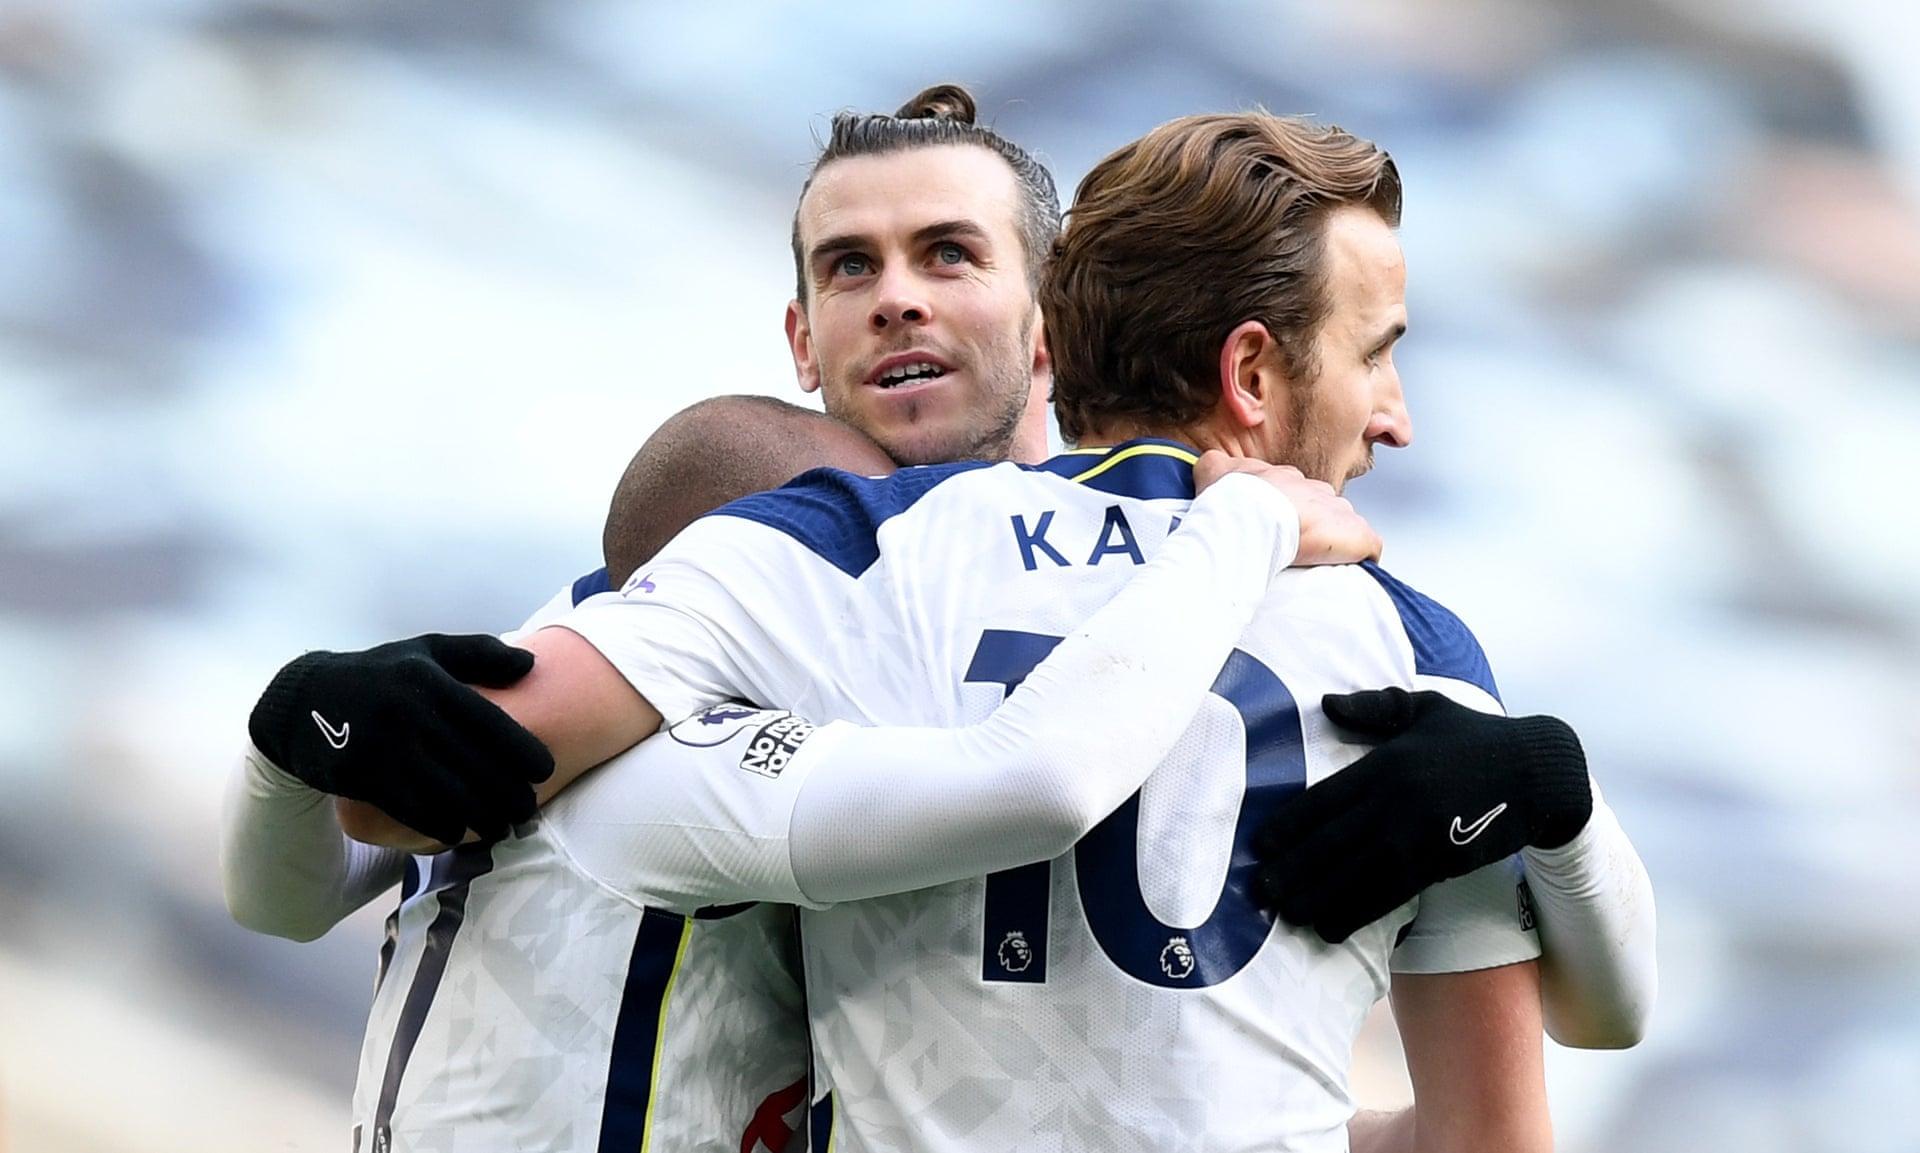 Bale แบ่งปันอย่างมีความสุขกับ Lucas Moura และ Kane หลังจากเพิ่มคะแนน 4-0 ให้กับท็อตแนม  ภาพ: PA